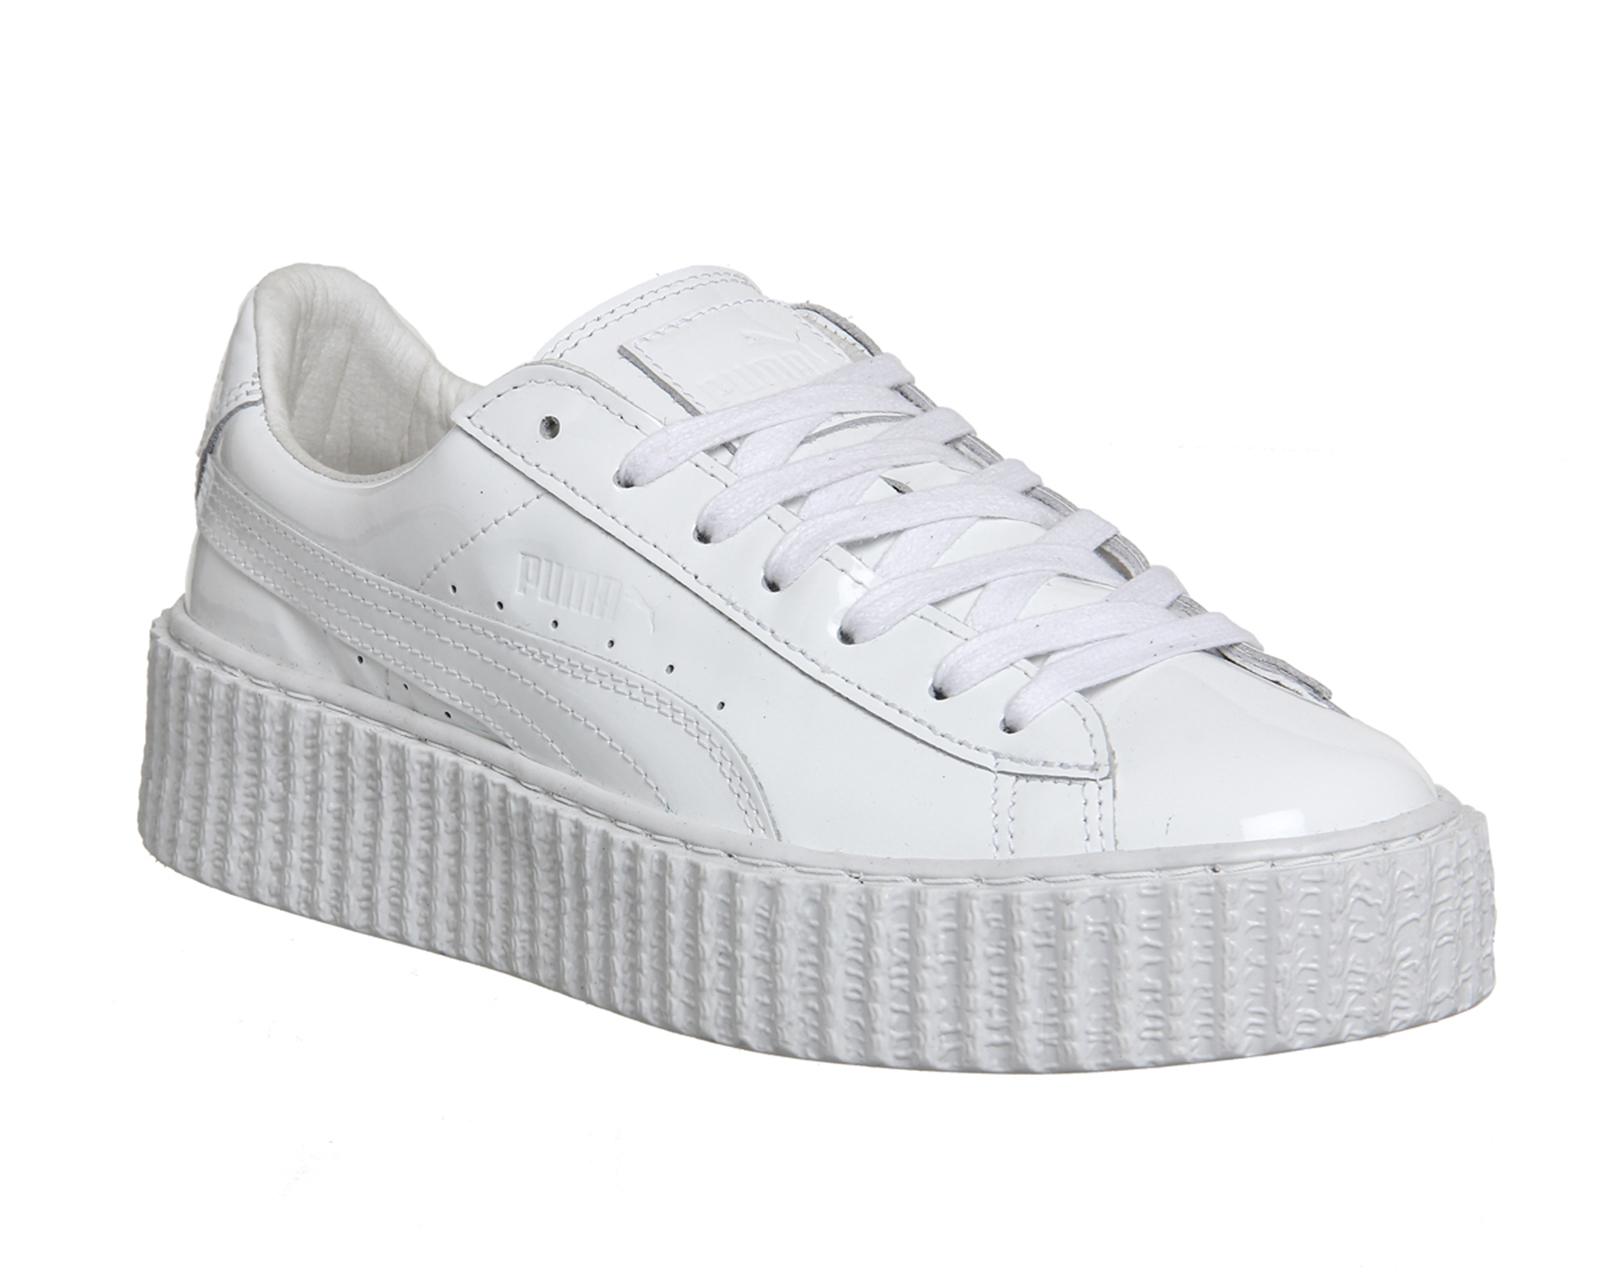 Puma Basket Creepers in White  05aedea74